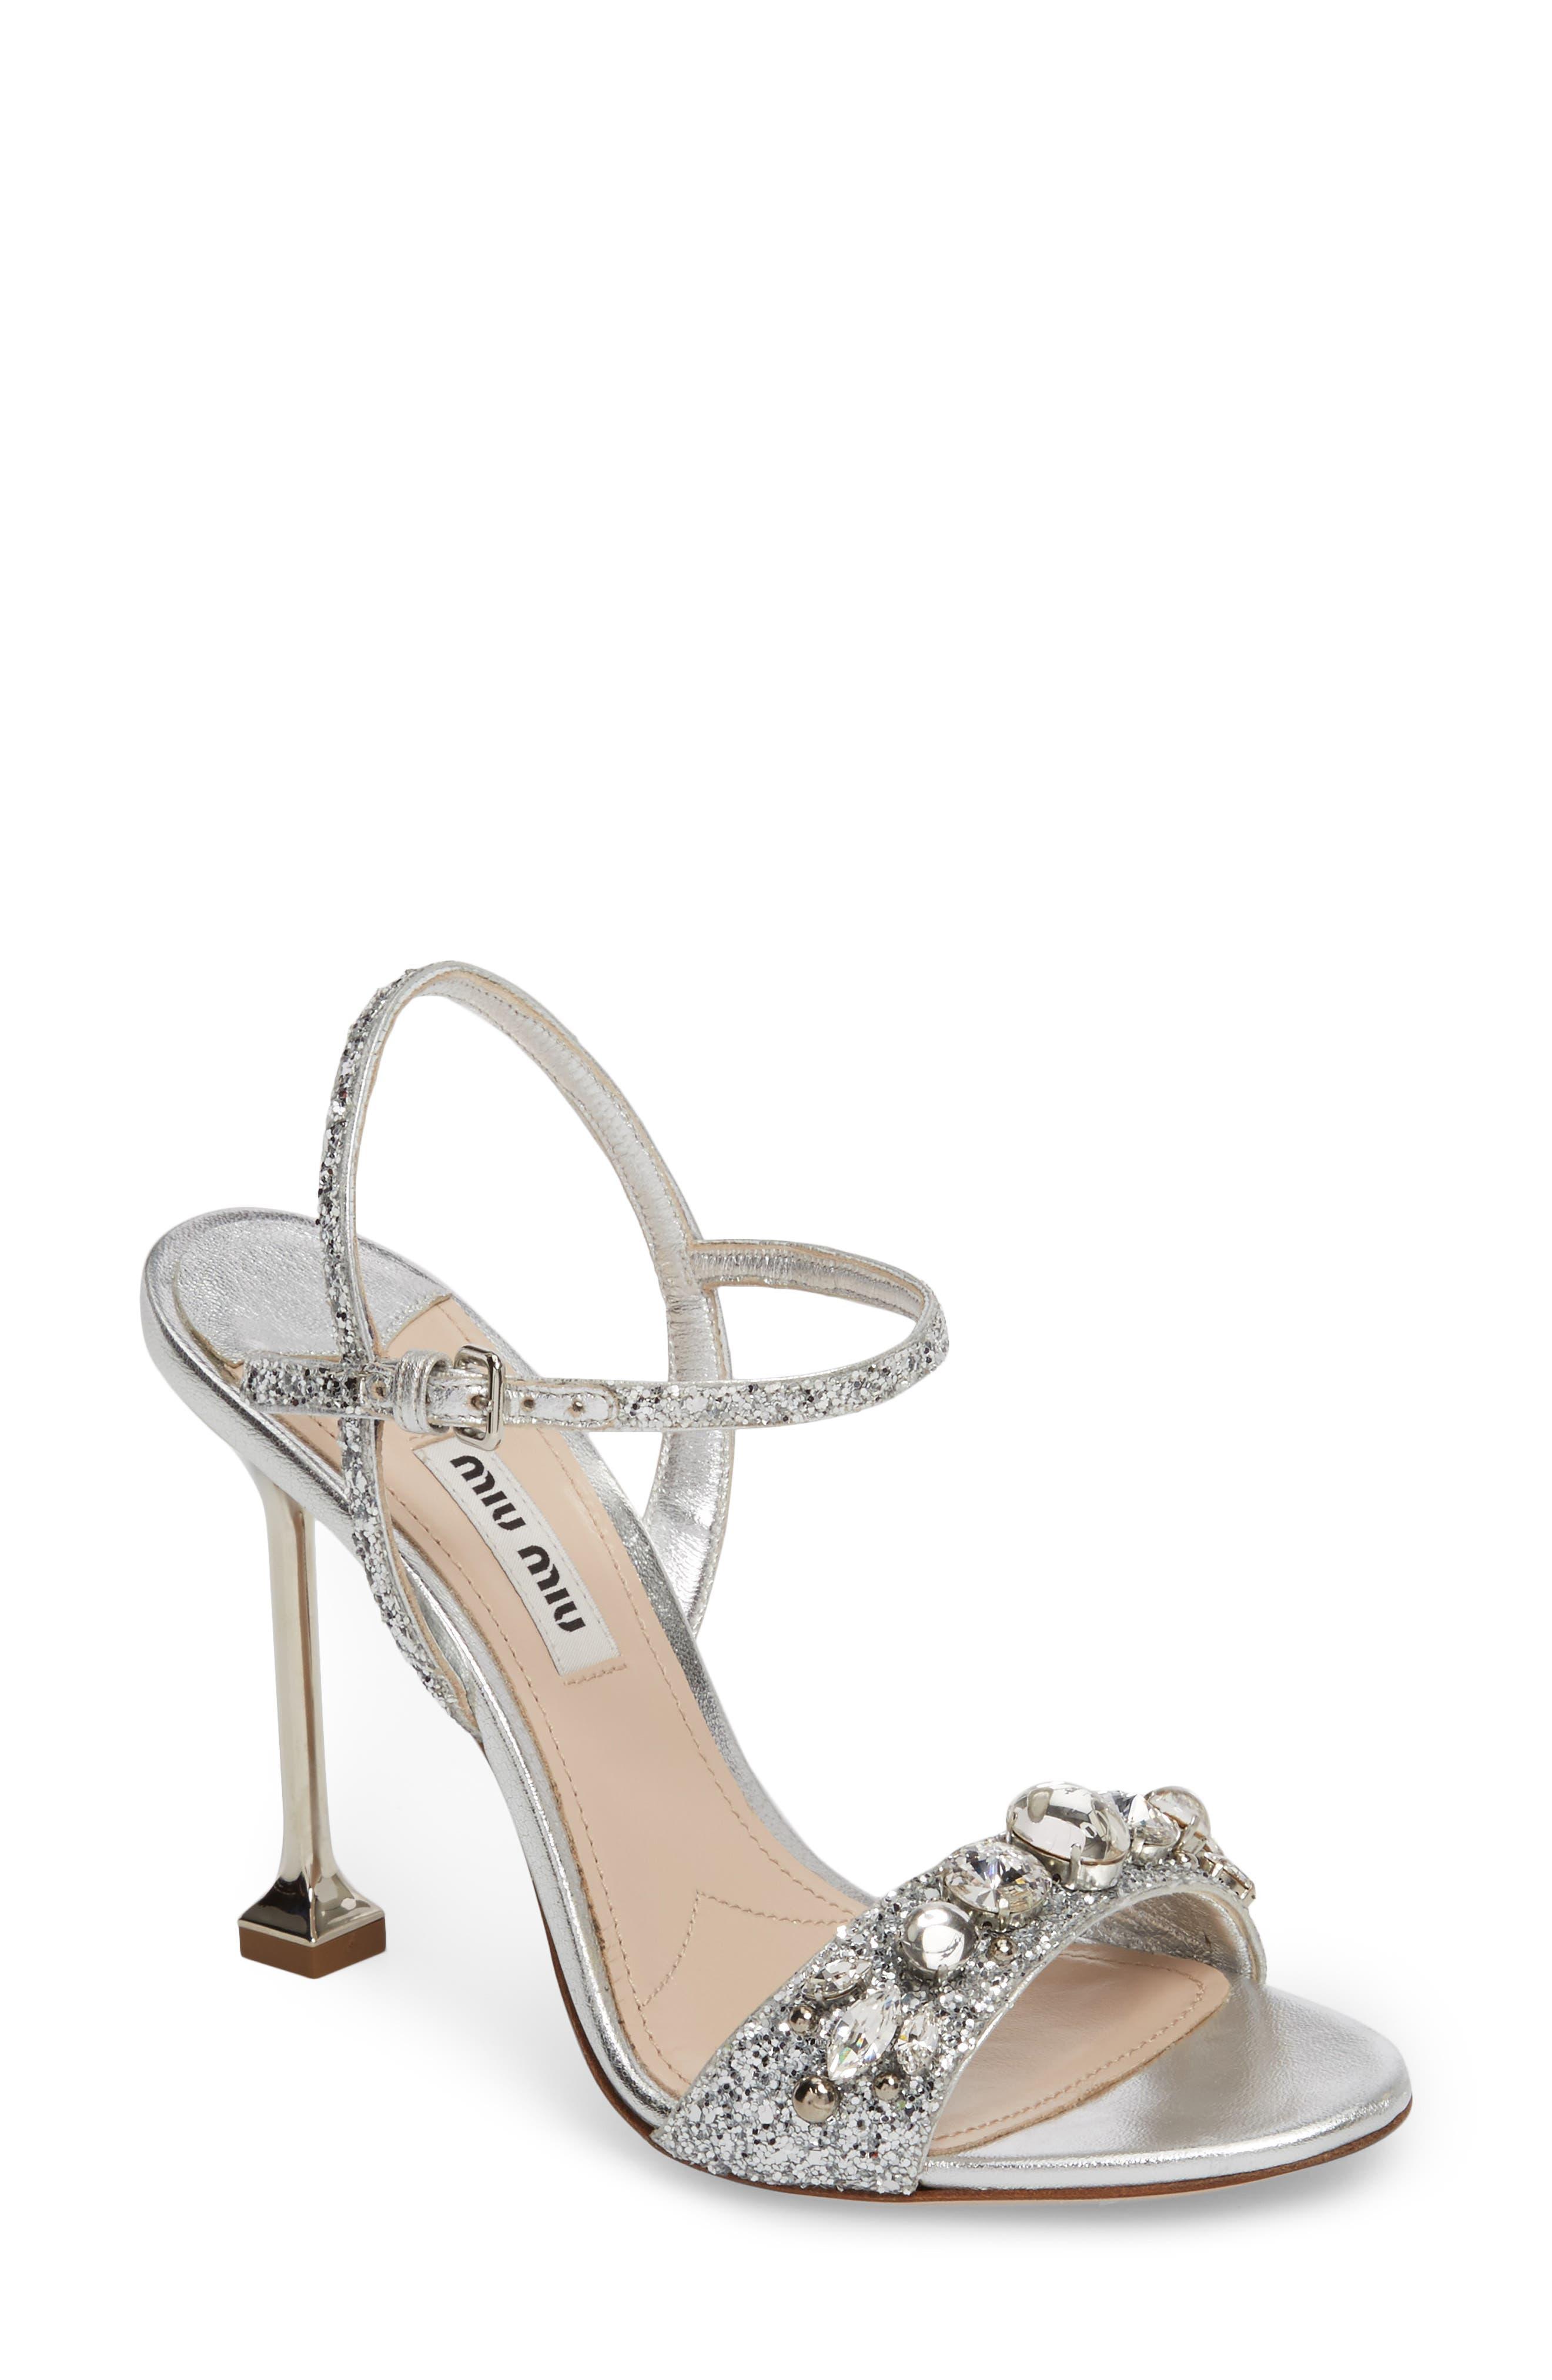 Miu Miu Embellished Ankle Strap Sandal (Women)